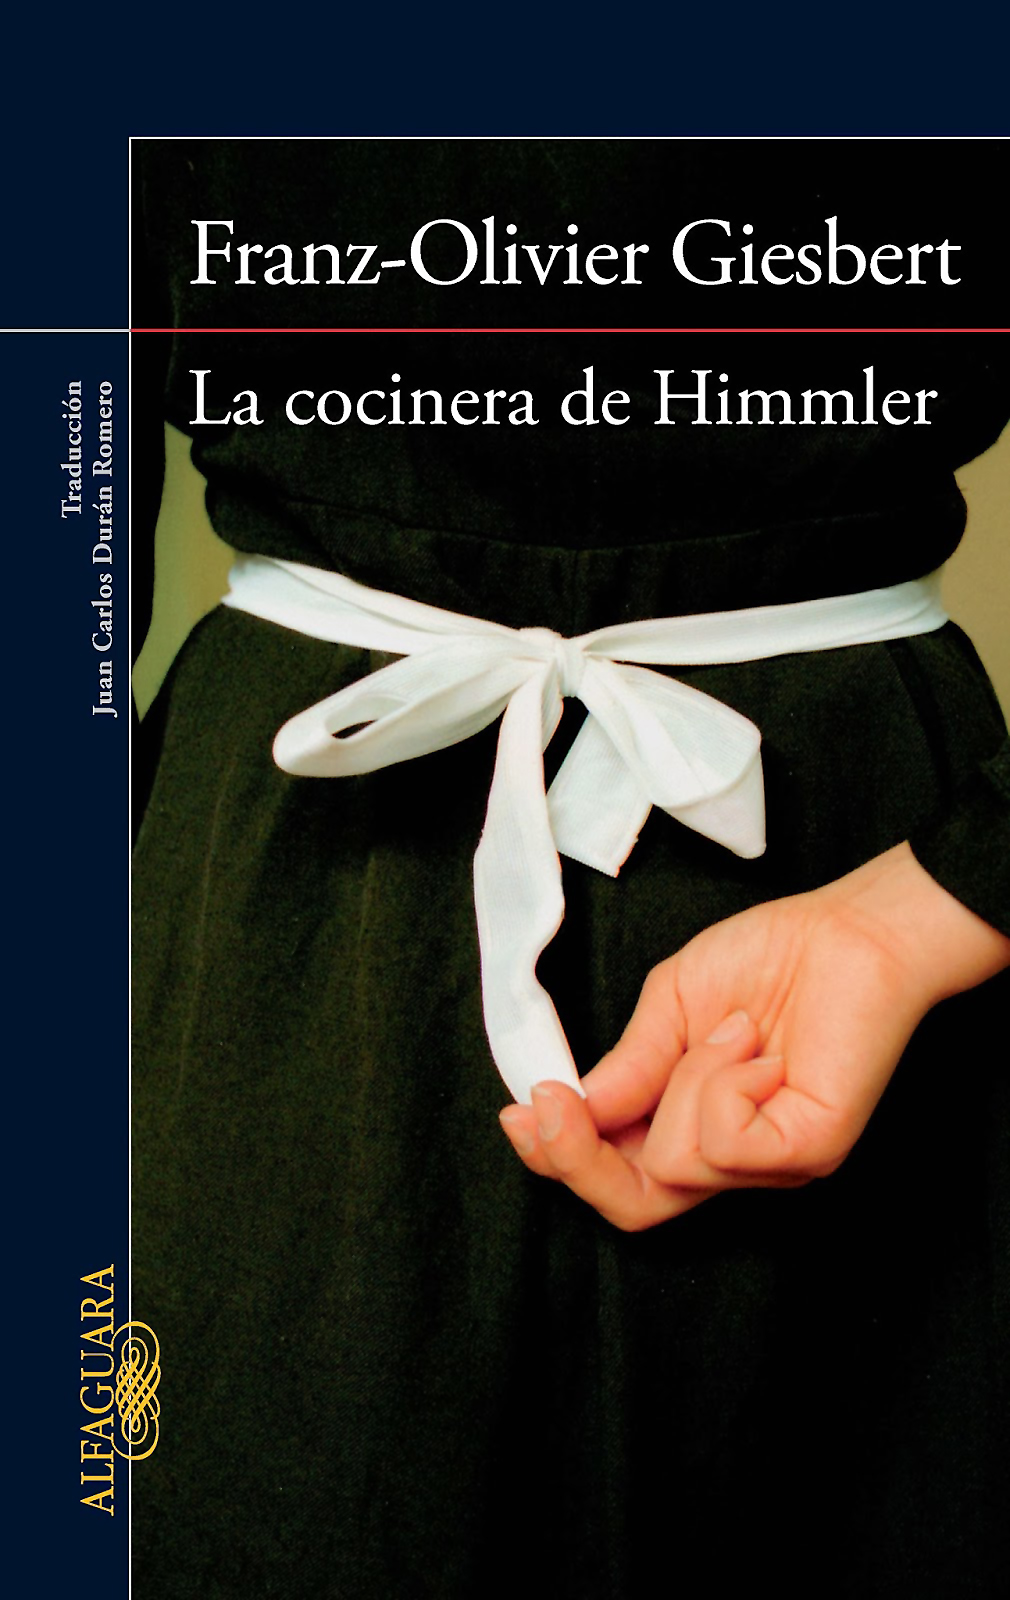 cocinera-Himmler-recetas-bruja